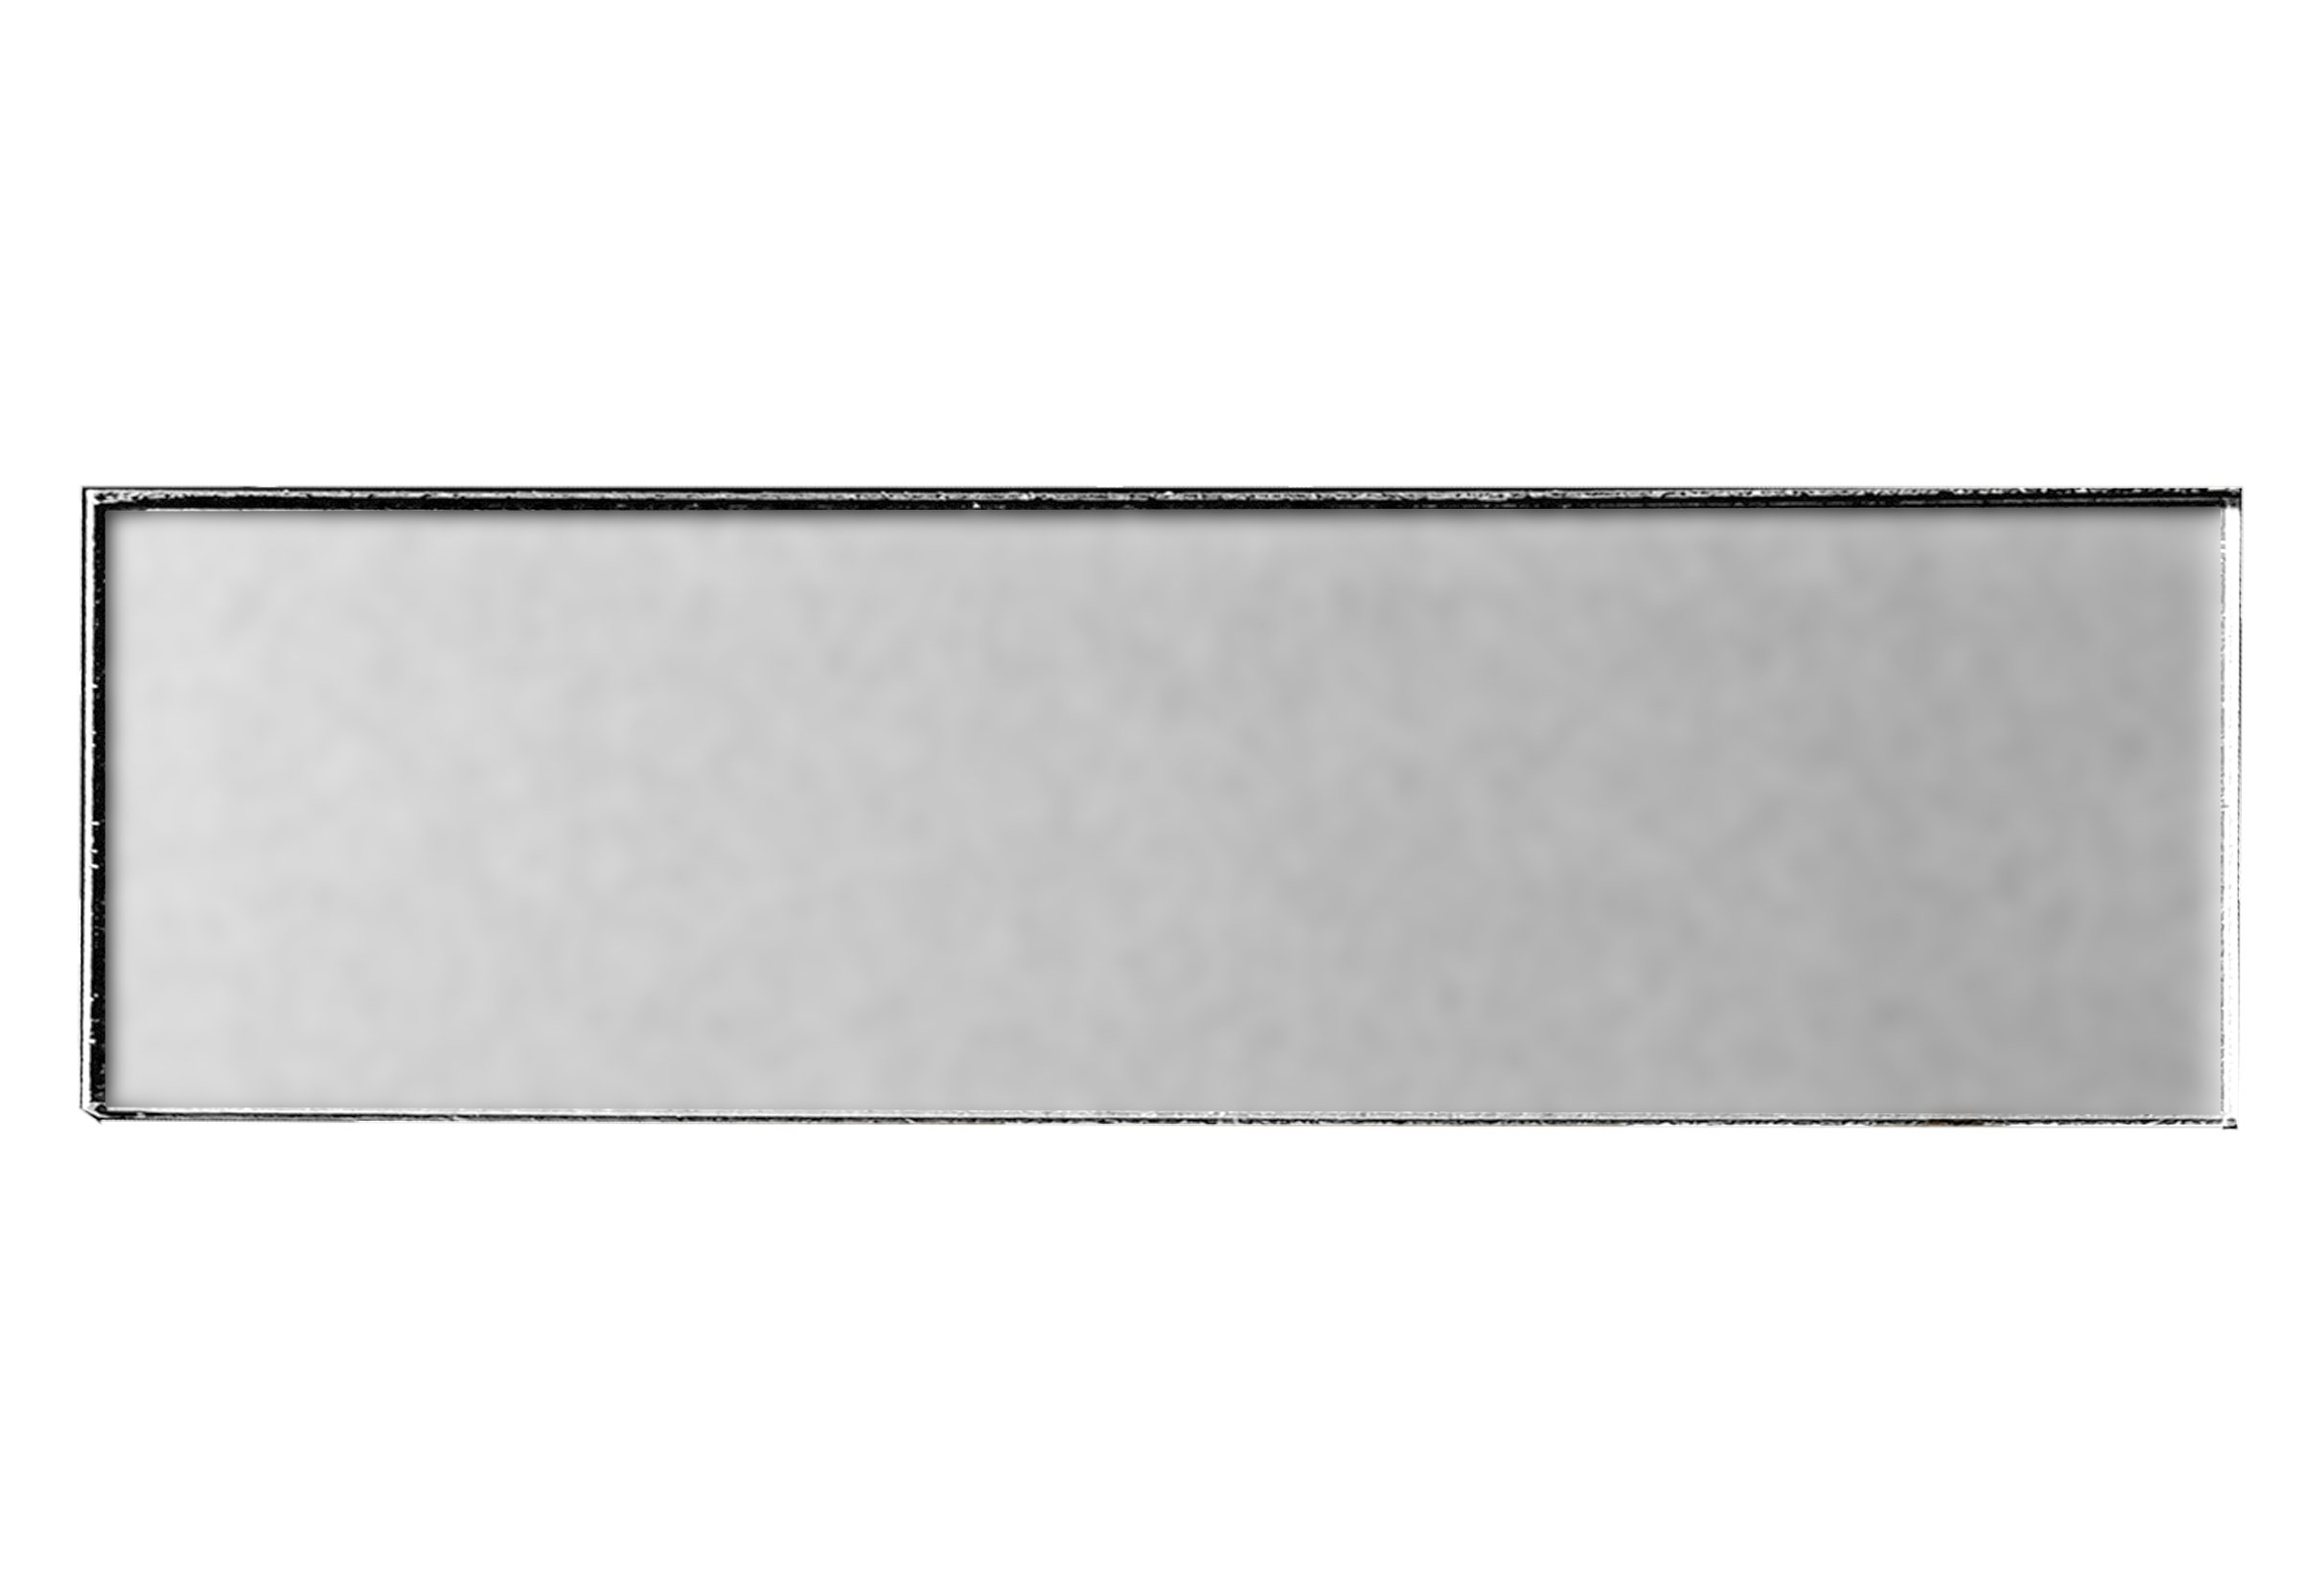 Abolos AMZFOM0312-ES Matte Glass Subway Tile Kitchen Bathroom Backsplash Home, 3'' W x L, 5 sq. ft, Bronze, 20 Piece 3'' W x L, 5, 3'' W x 12'' L, Silver